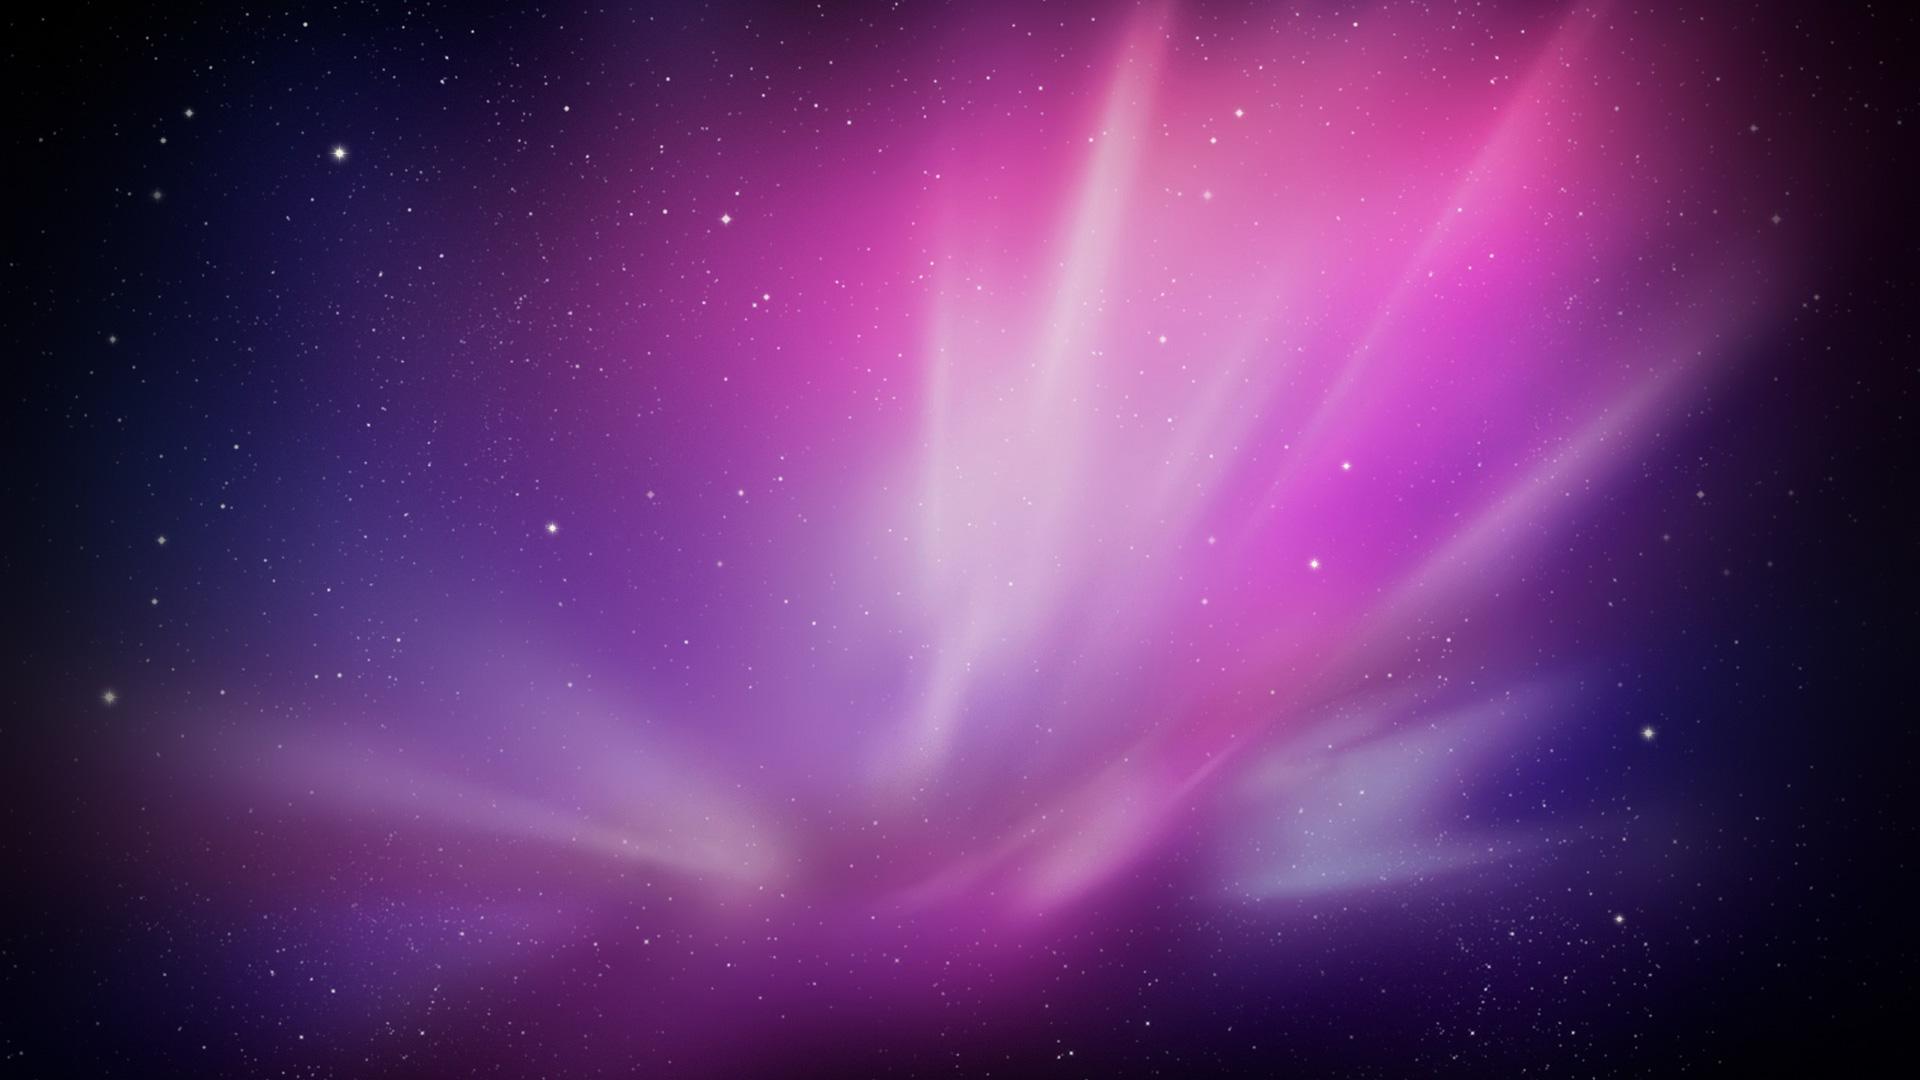 Free Download Tech Full Hd Wallpapers Download 1080p Desktop